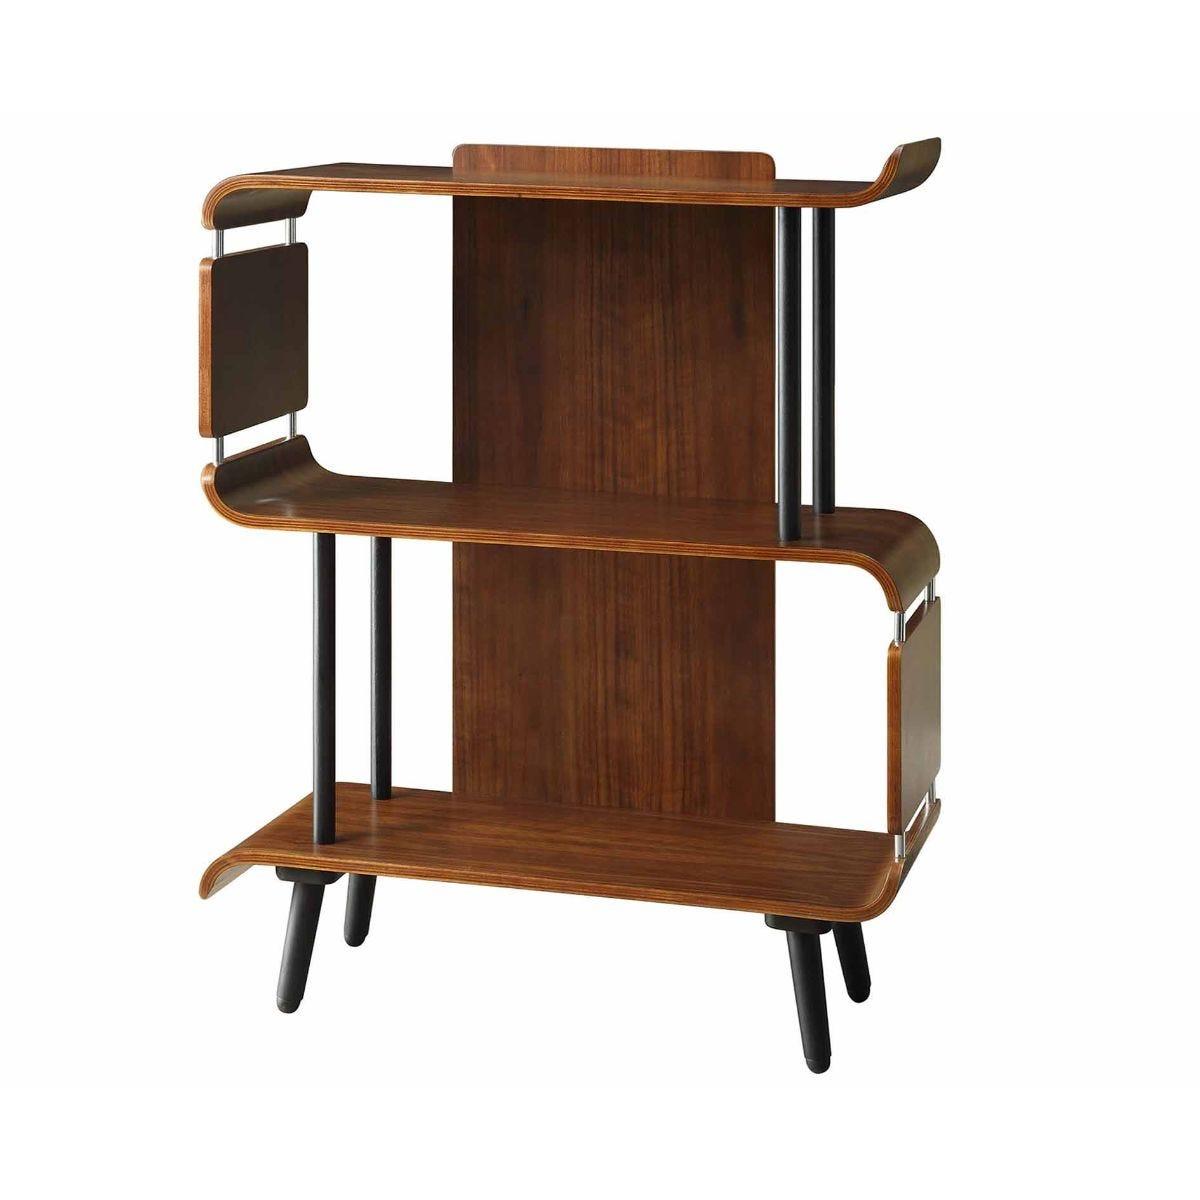 Jual Vienna Walnut Short Bookcase, Walnut